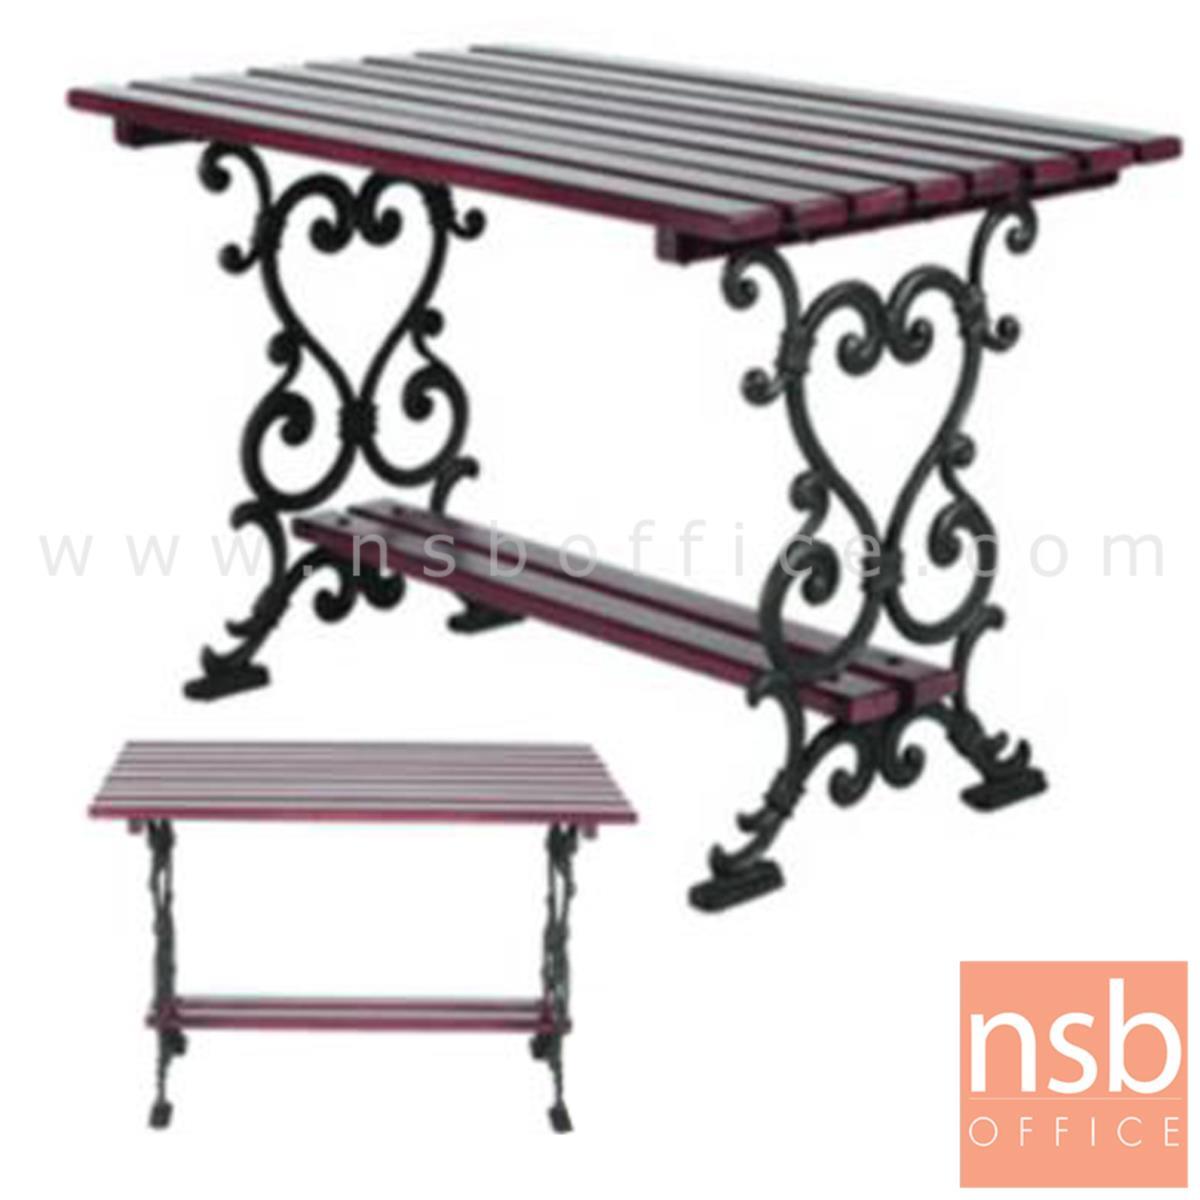 G08A041:โต๊ะสนามไม้เต็ง เหล็กหล่อ กทม. BKK-TOO10 (100, 120, 150, 200 cm)